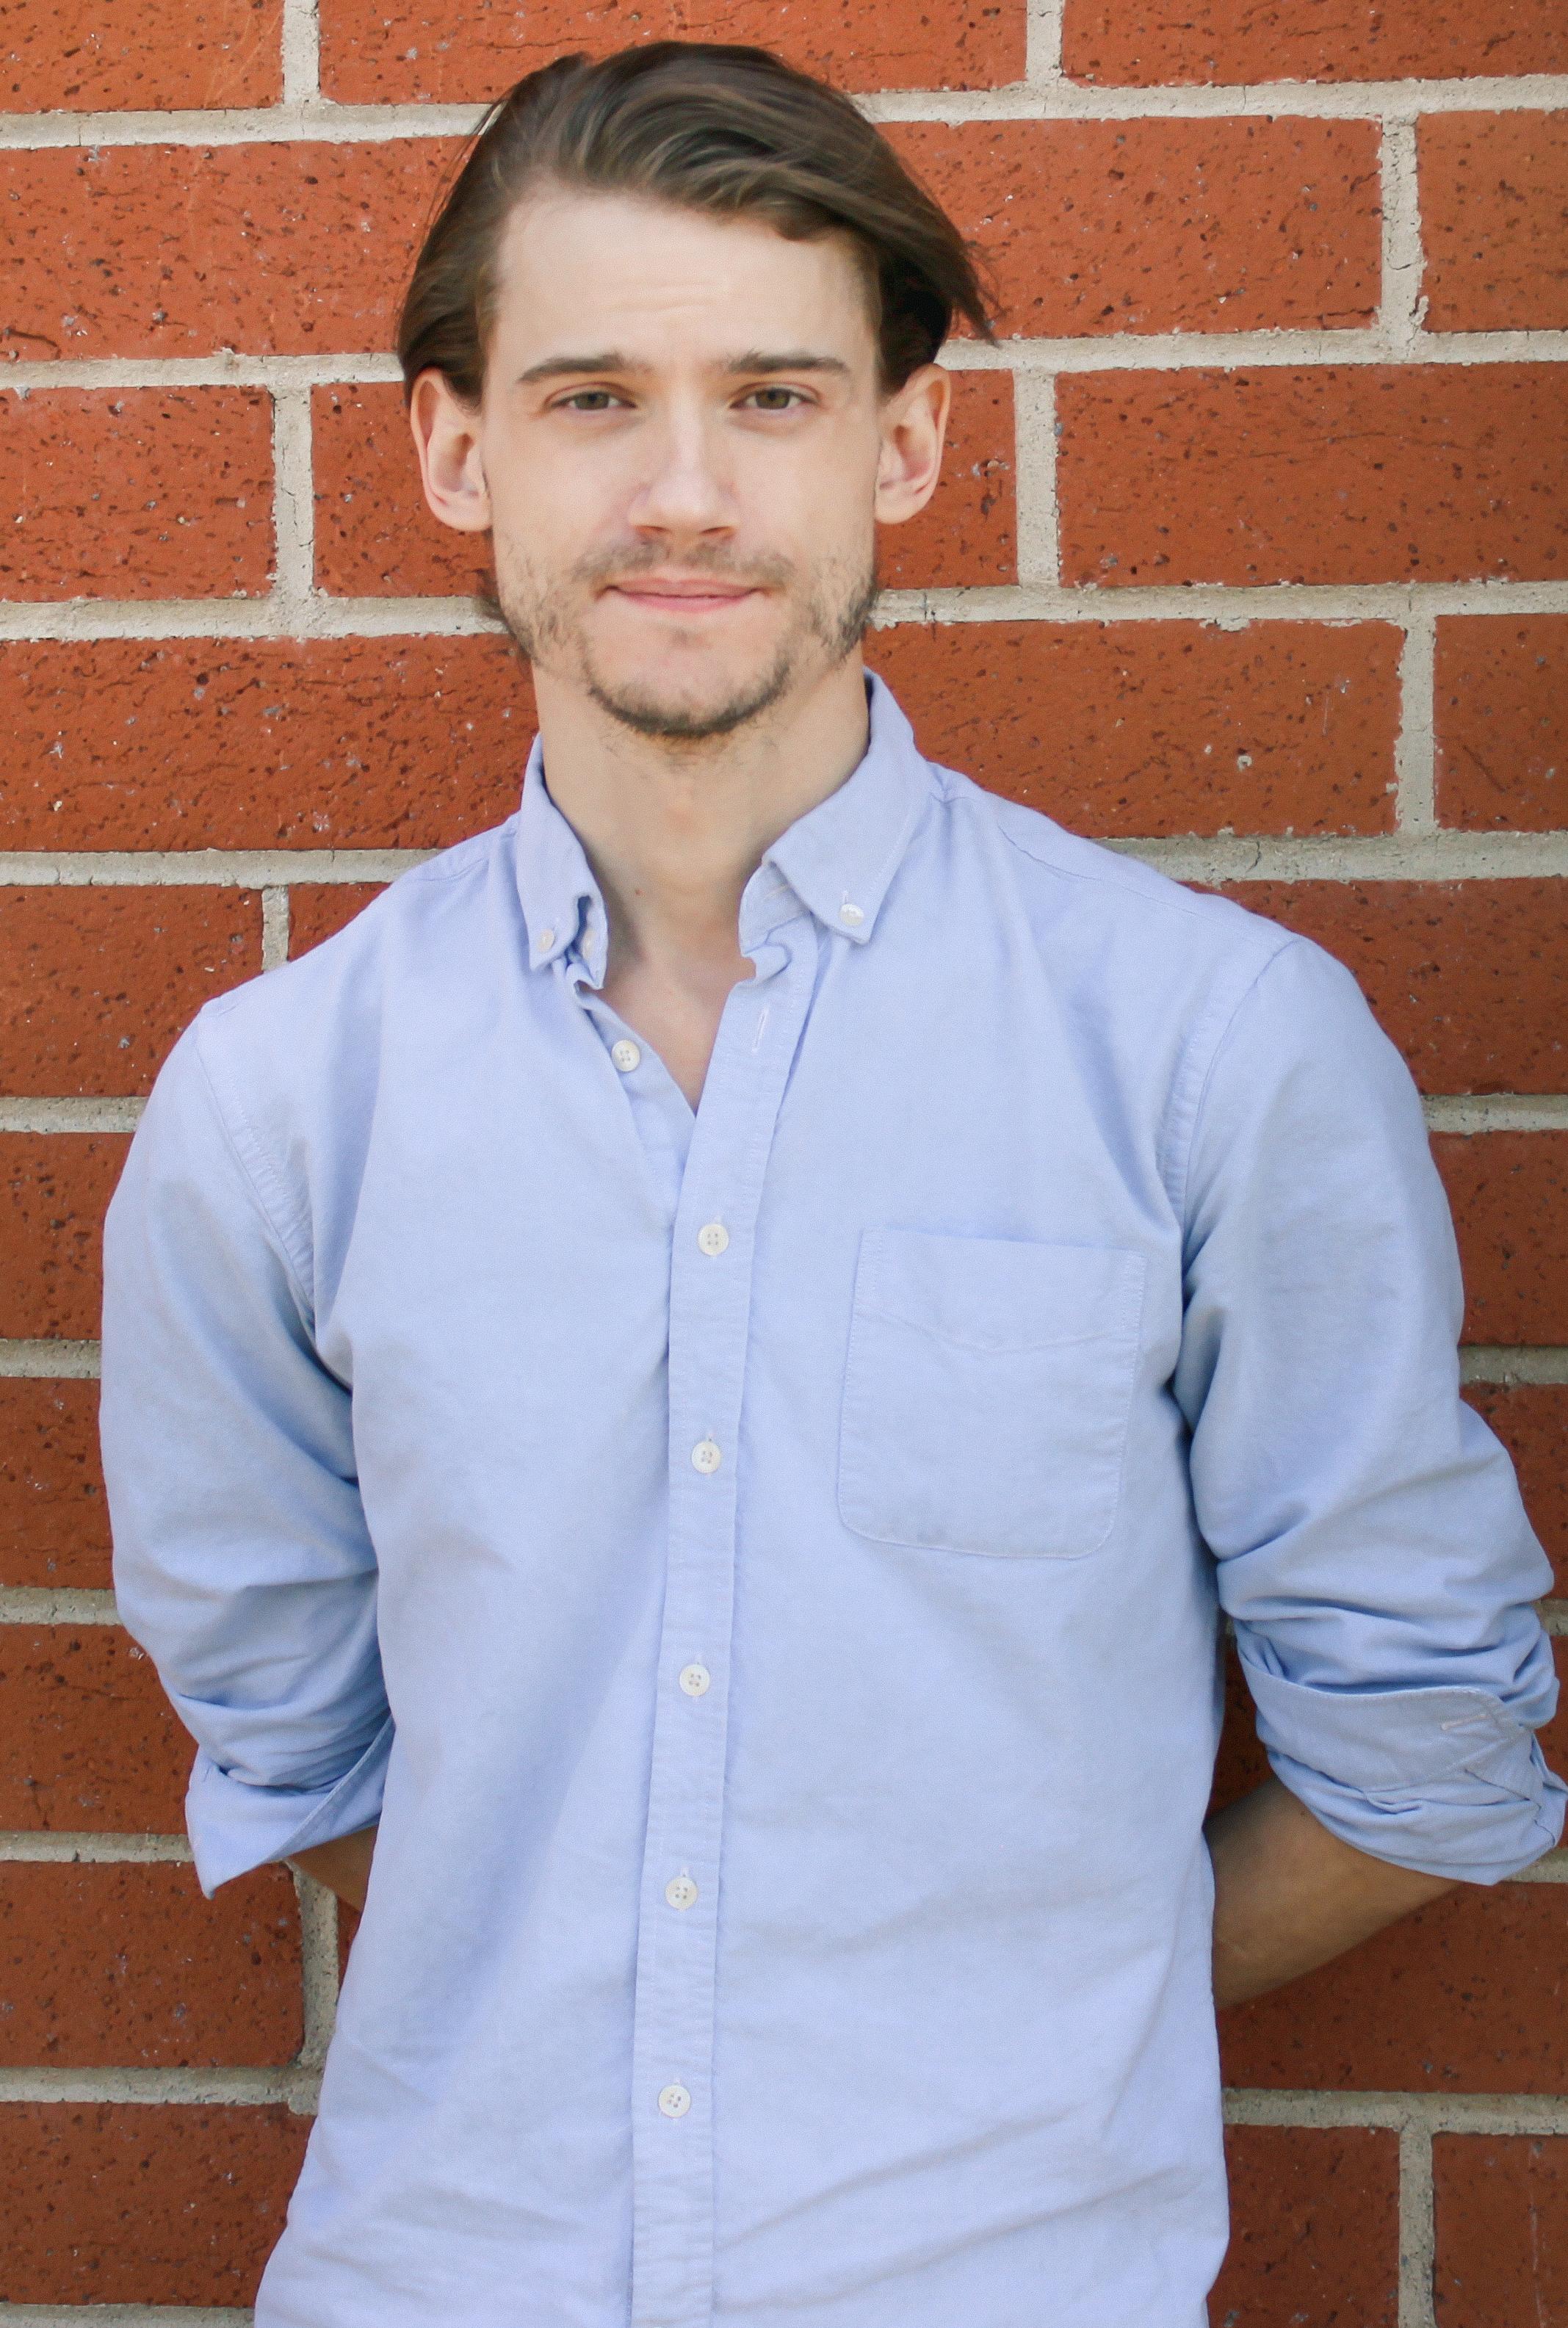 Owen Beckman as Terence